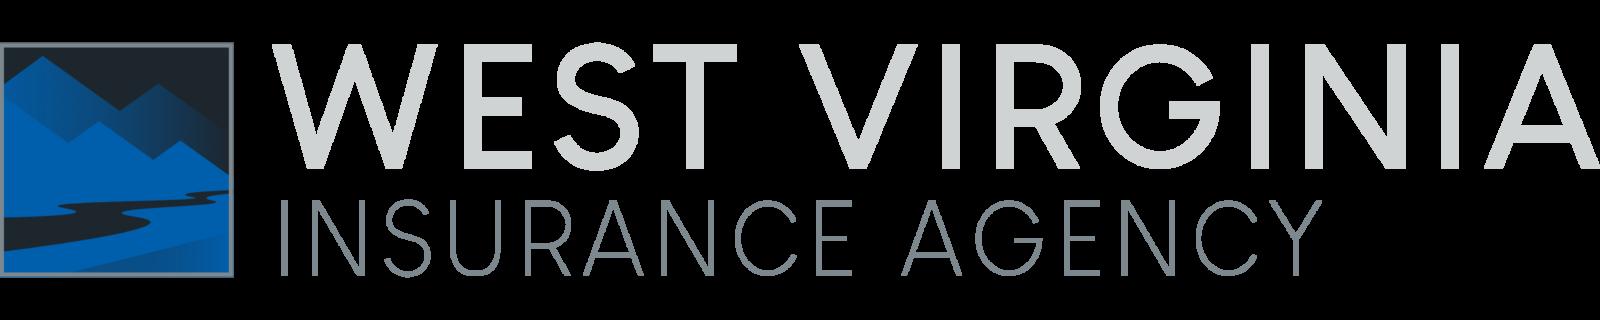 WestVirginiaInsuranceAgency-Logo-Concept-V1